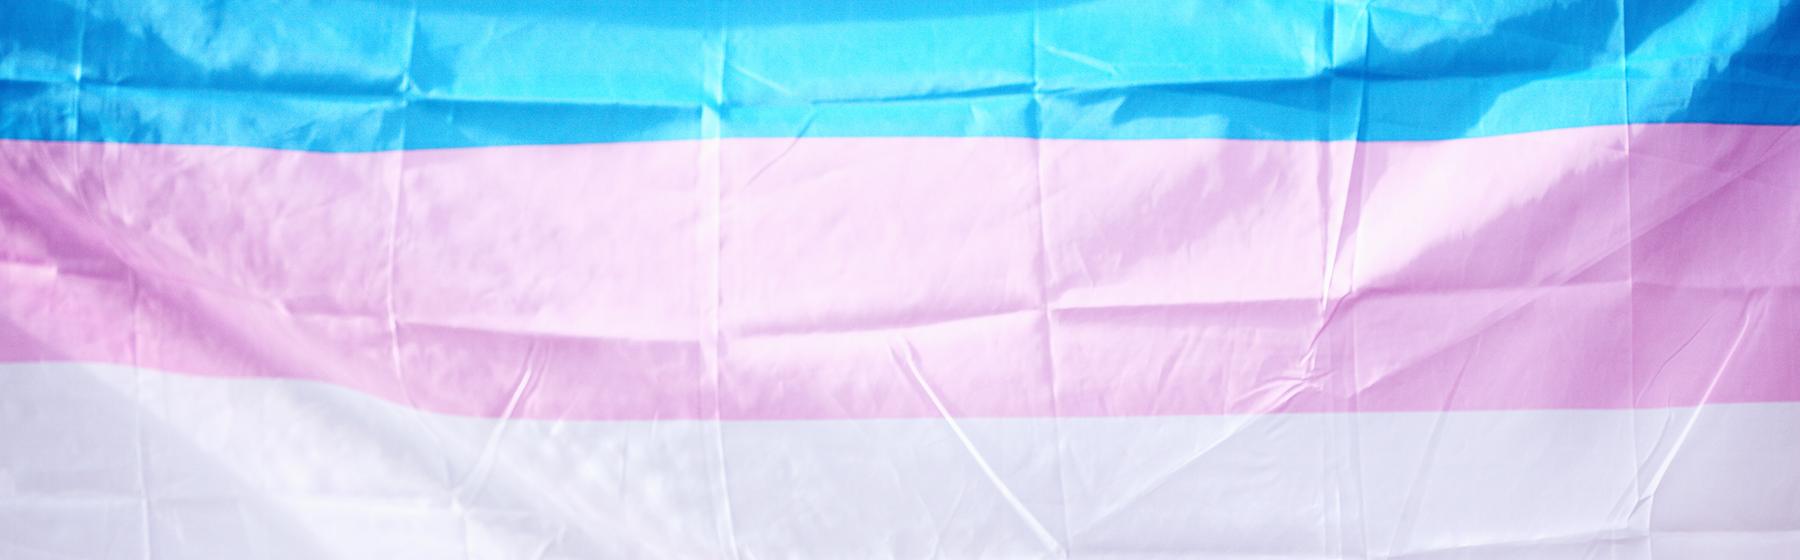 Pictured is a transgender flag.